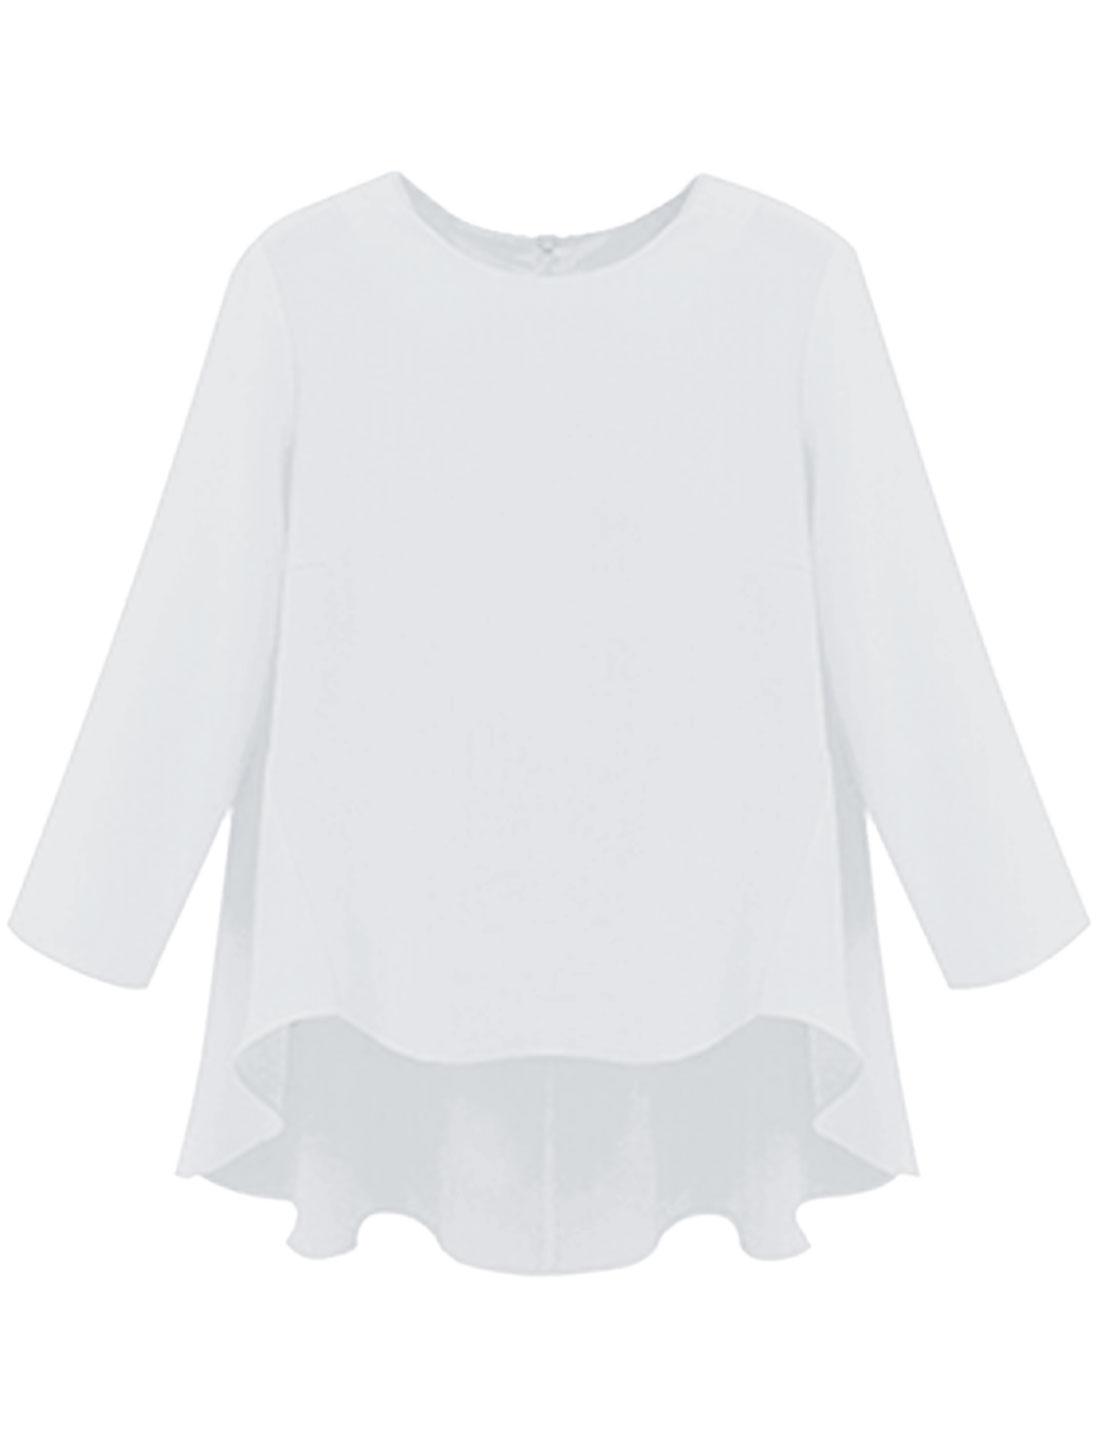 Women Asmmetric Hem Bracelet Sleeves Round Neck Chiffont Top White L